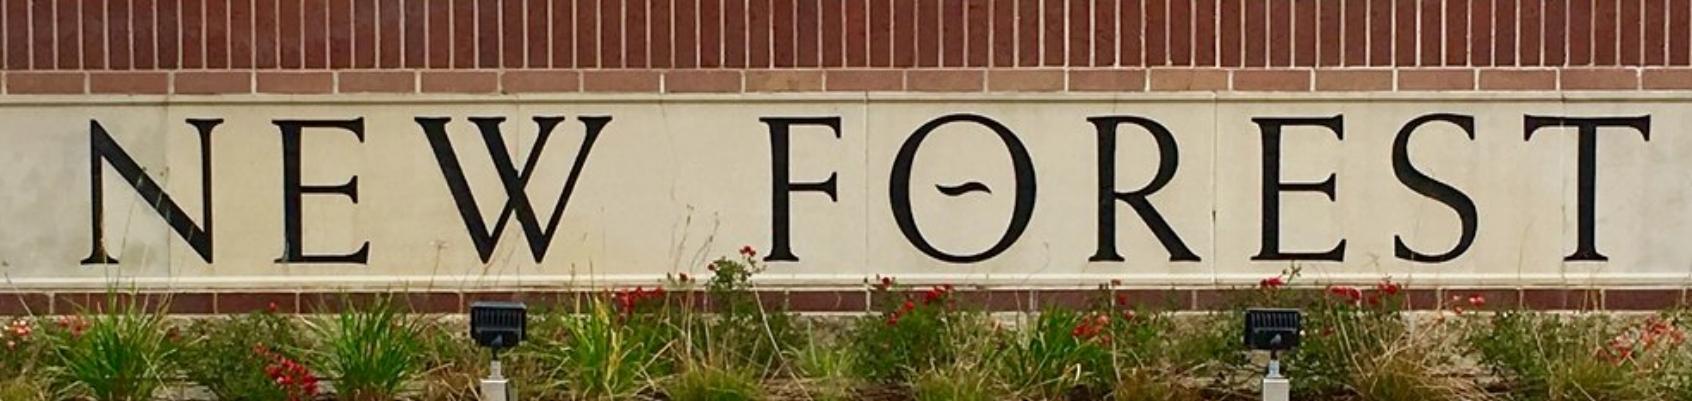 New Forest Glen_Monument Sign_5 Months.jpg